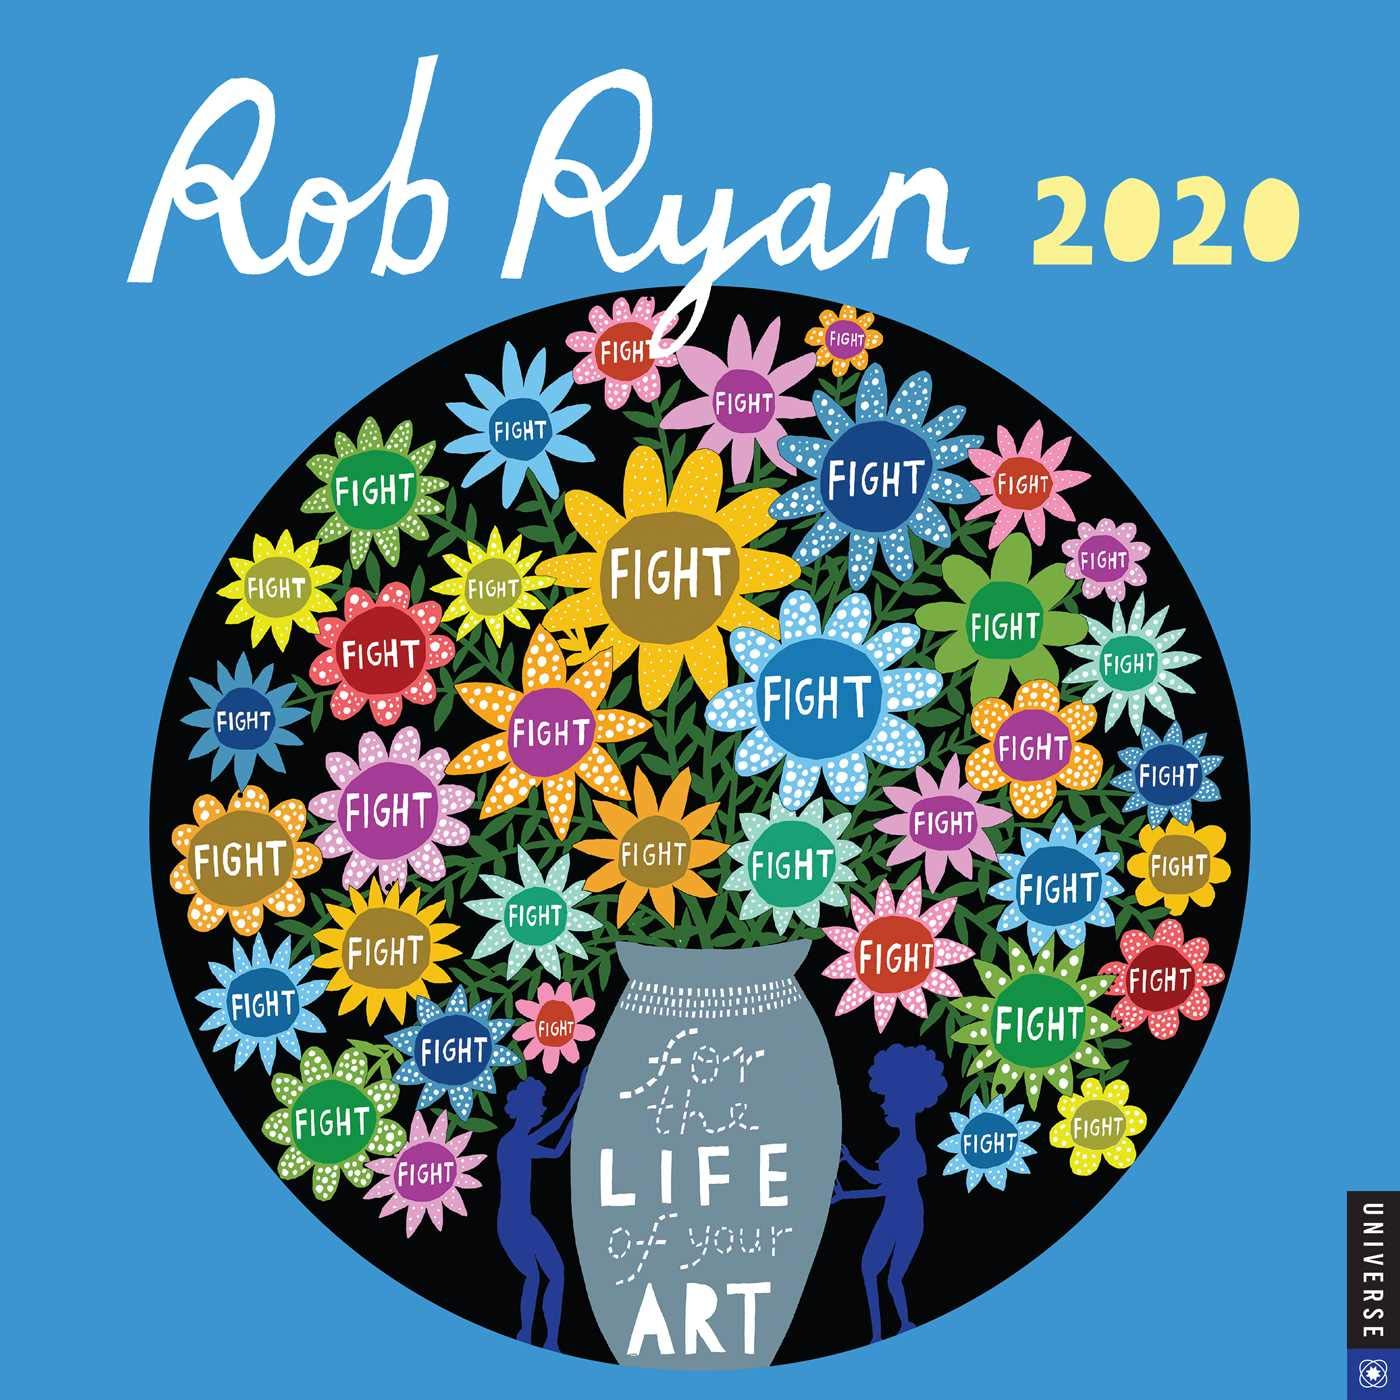 A Perfect Circle Tour 2020.Rob Ryan 2020 Wall Calendar Rob Ryan 9780789336293 Amazon